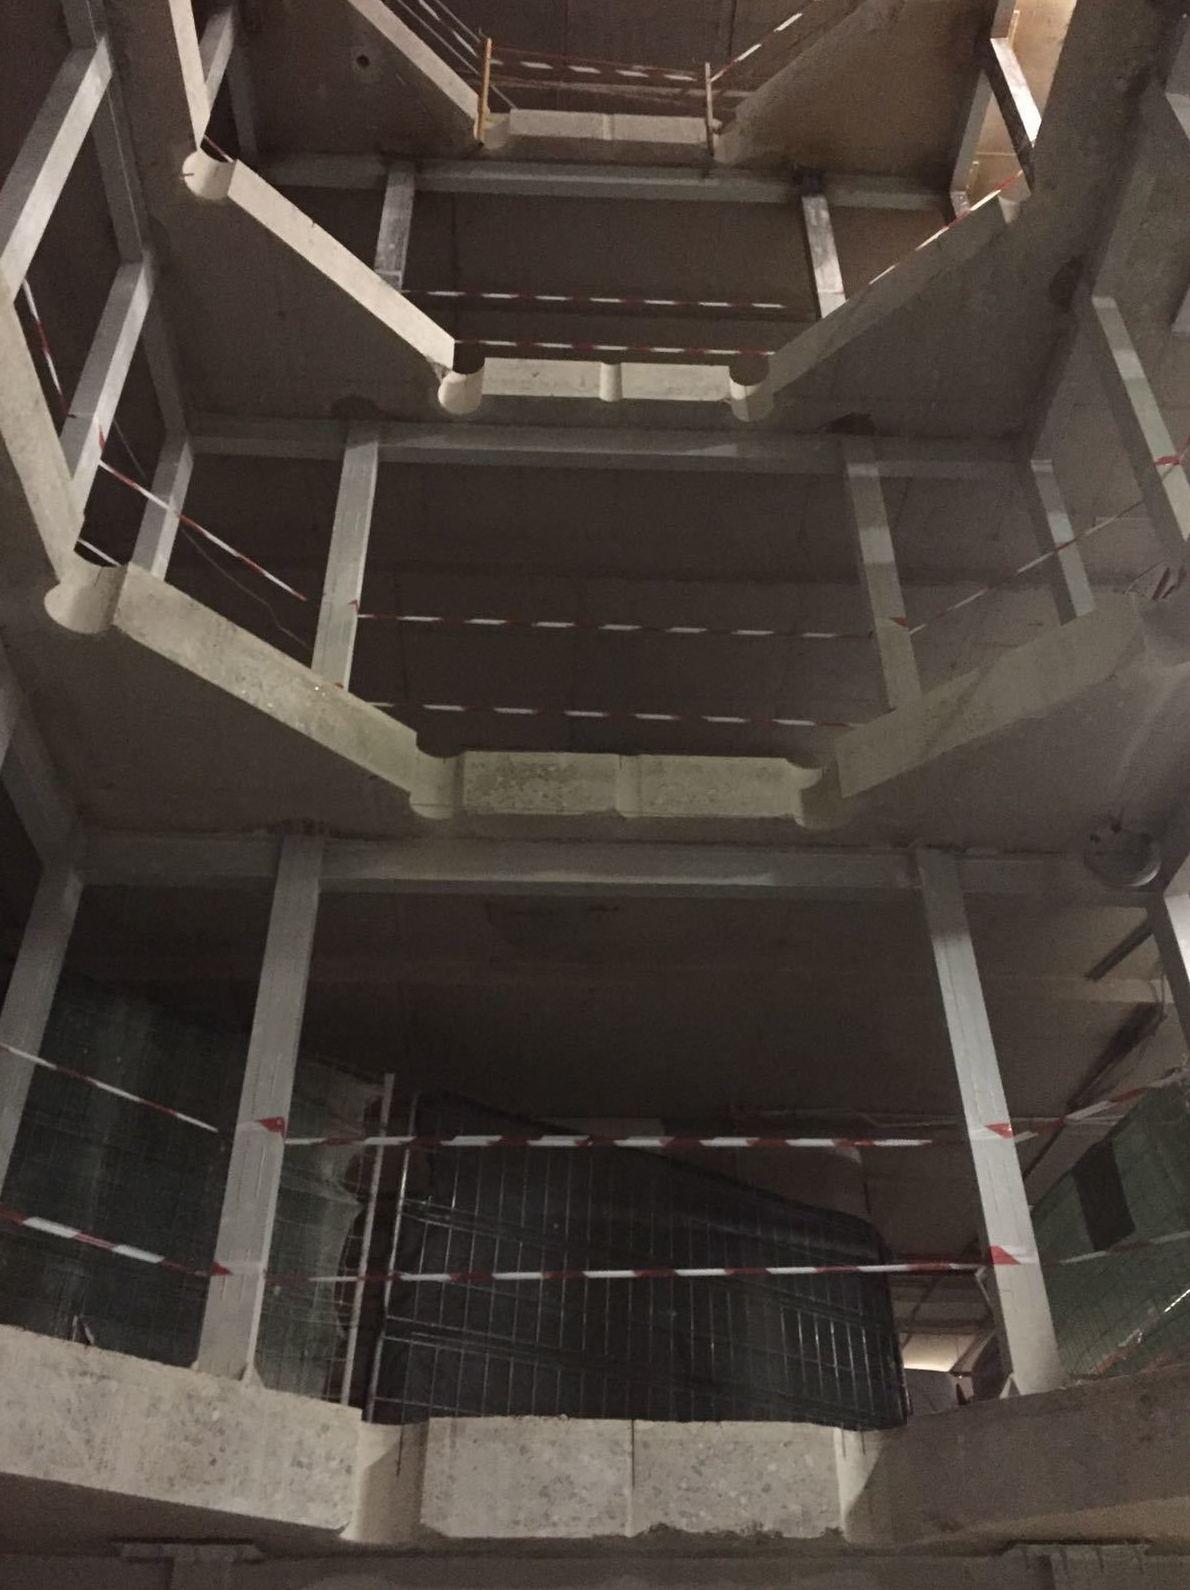 Cortes de cinco por cinco para huecos de escaleras